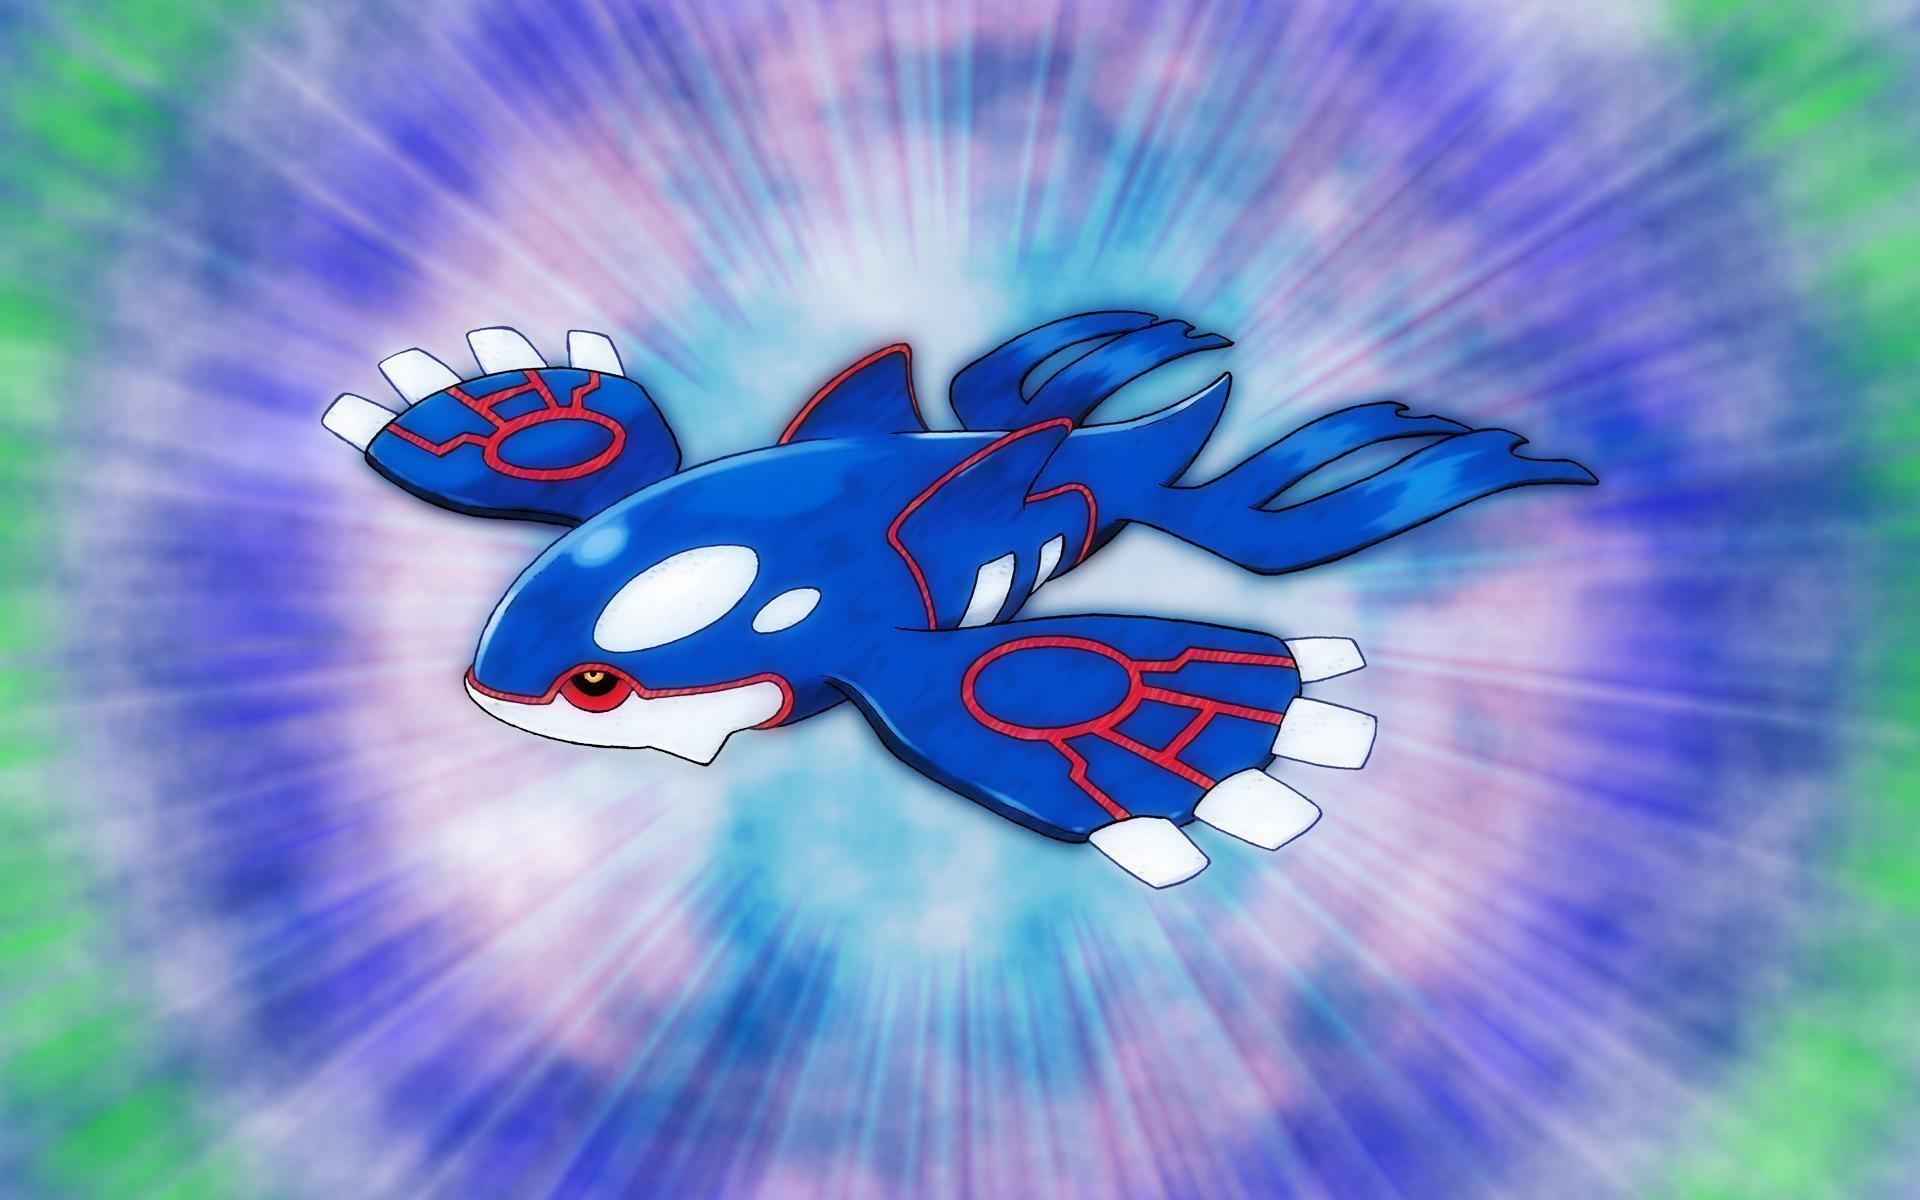 Kyogre Pokémon HD Wallpapers Backgrounds Wallpaper 1920×1200